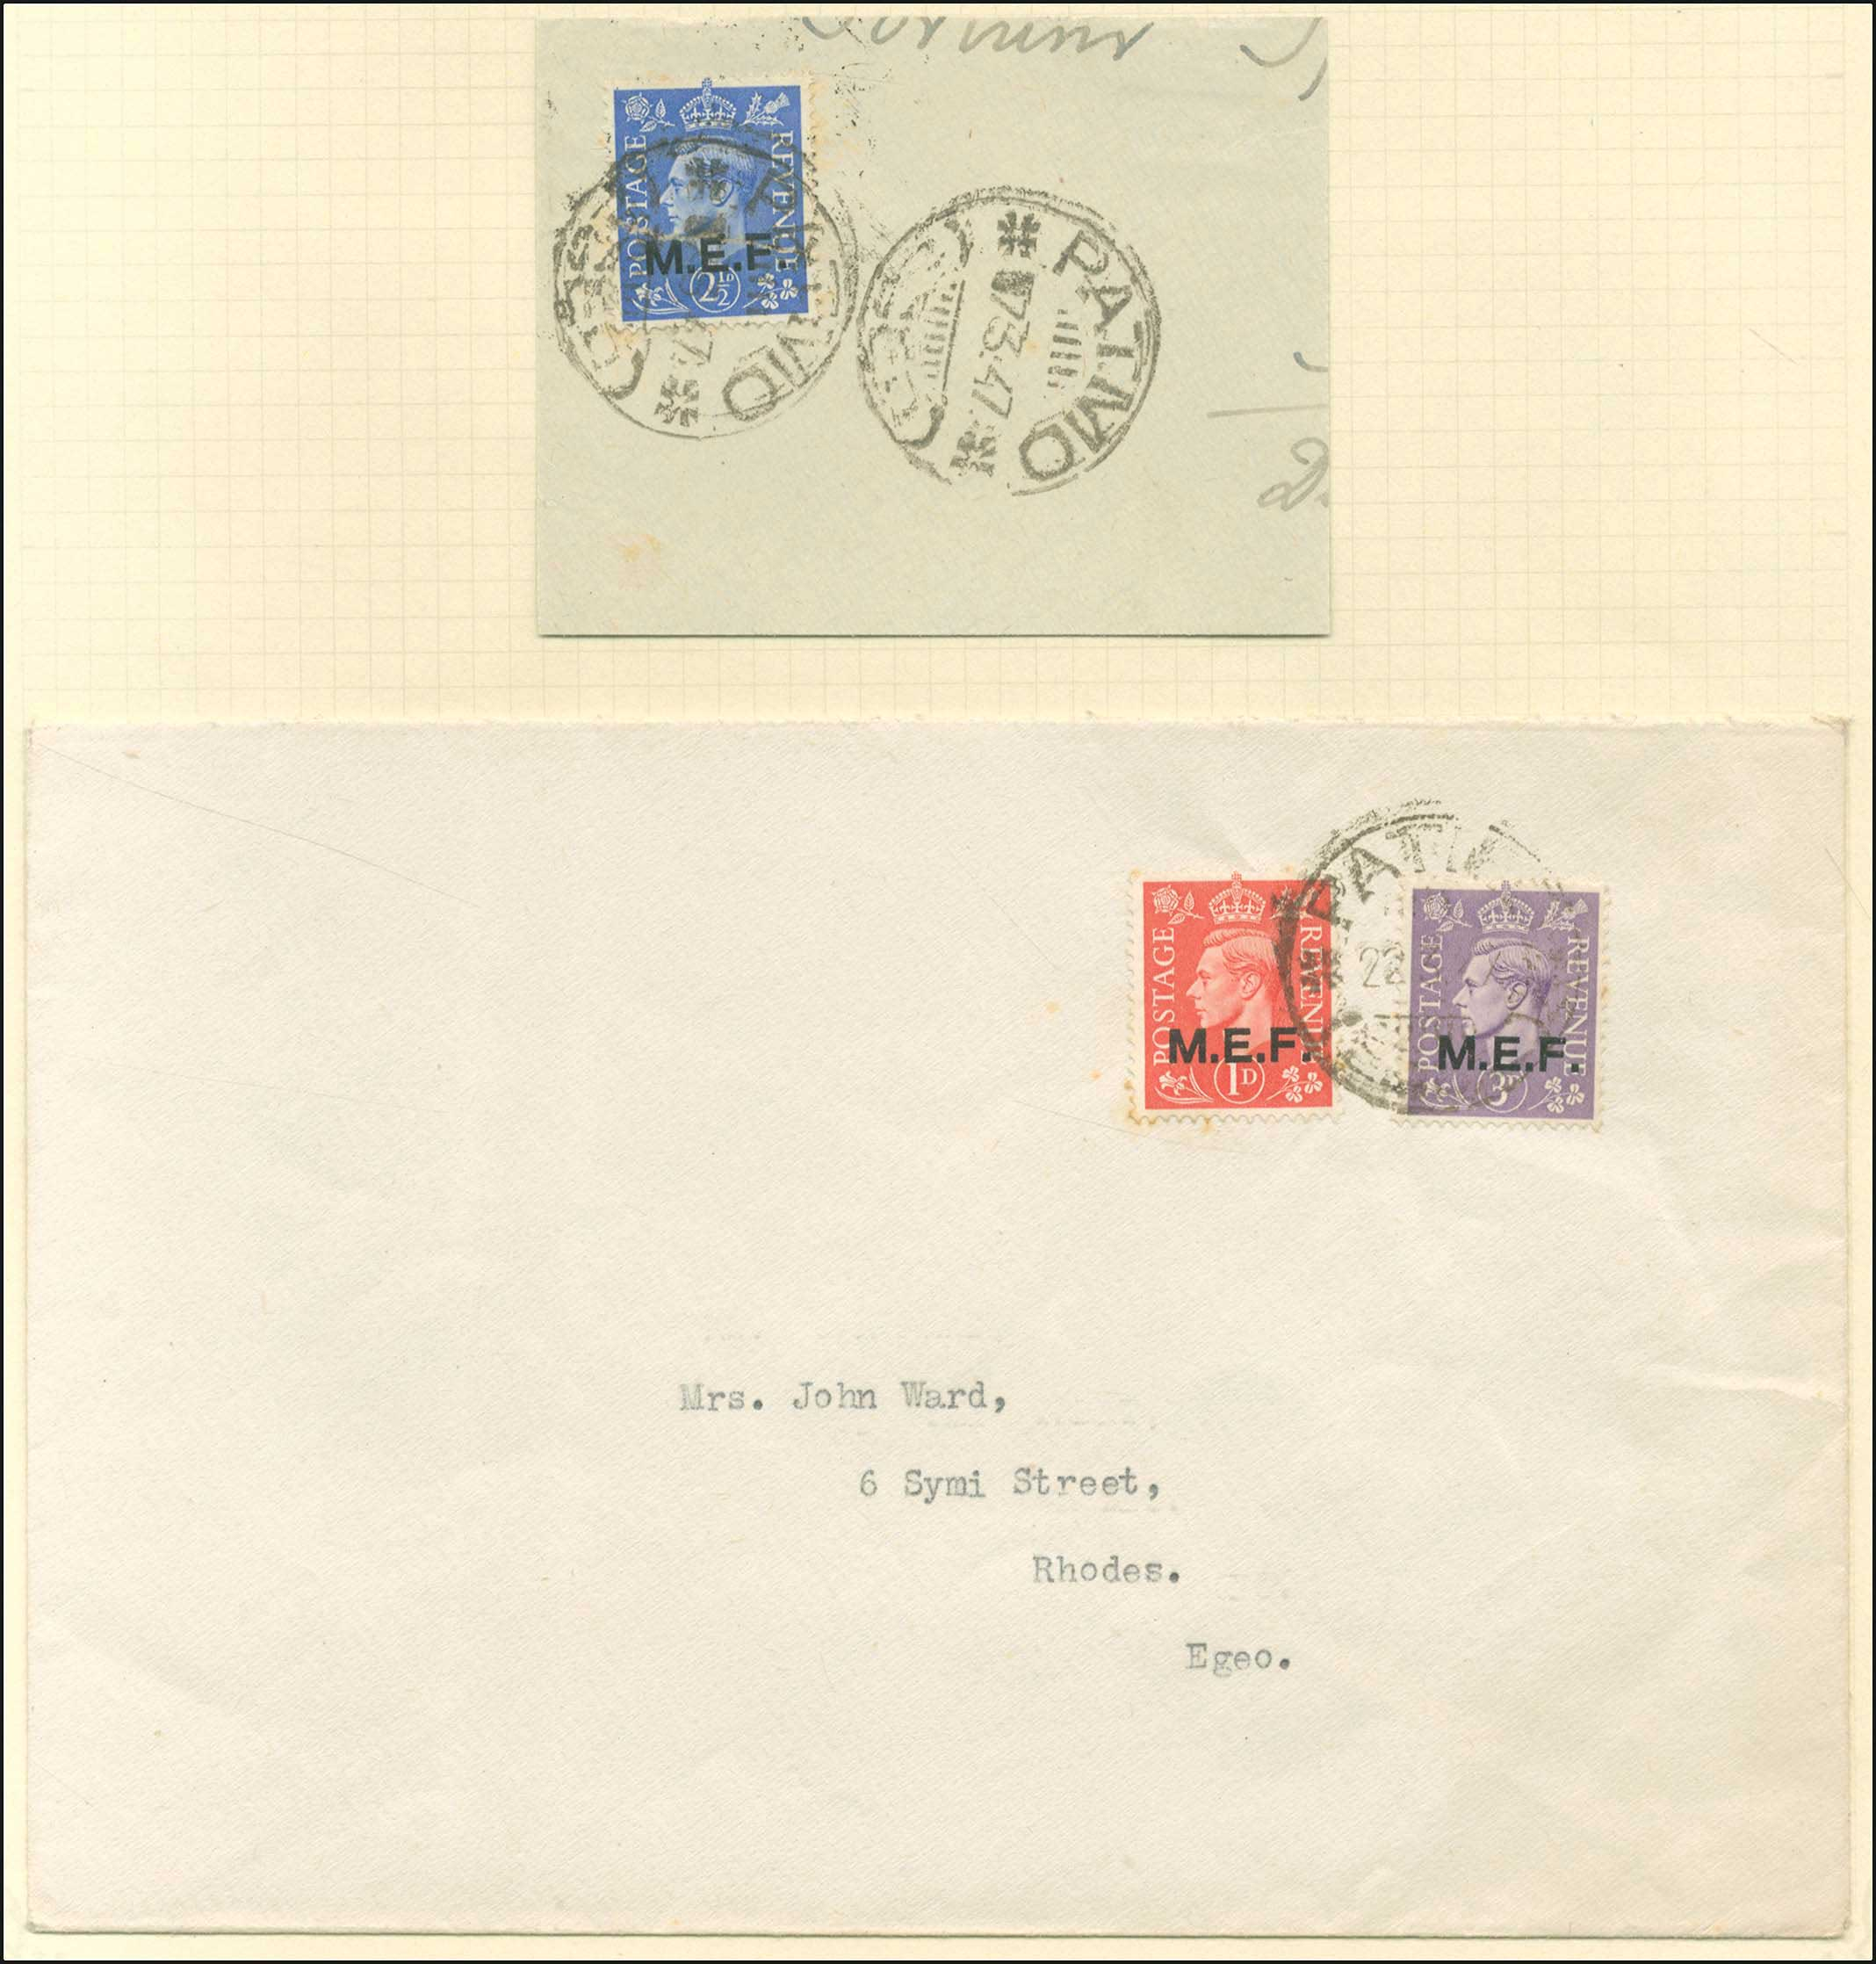 Lot 670 - -  DODECANESE British post-office (m.e.f.) -  A. Karamitsos Public Auction 654